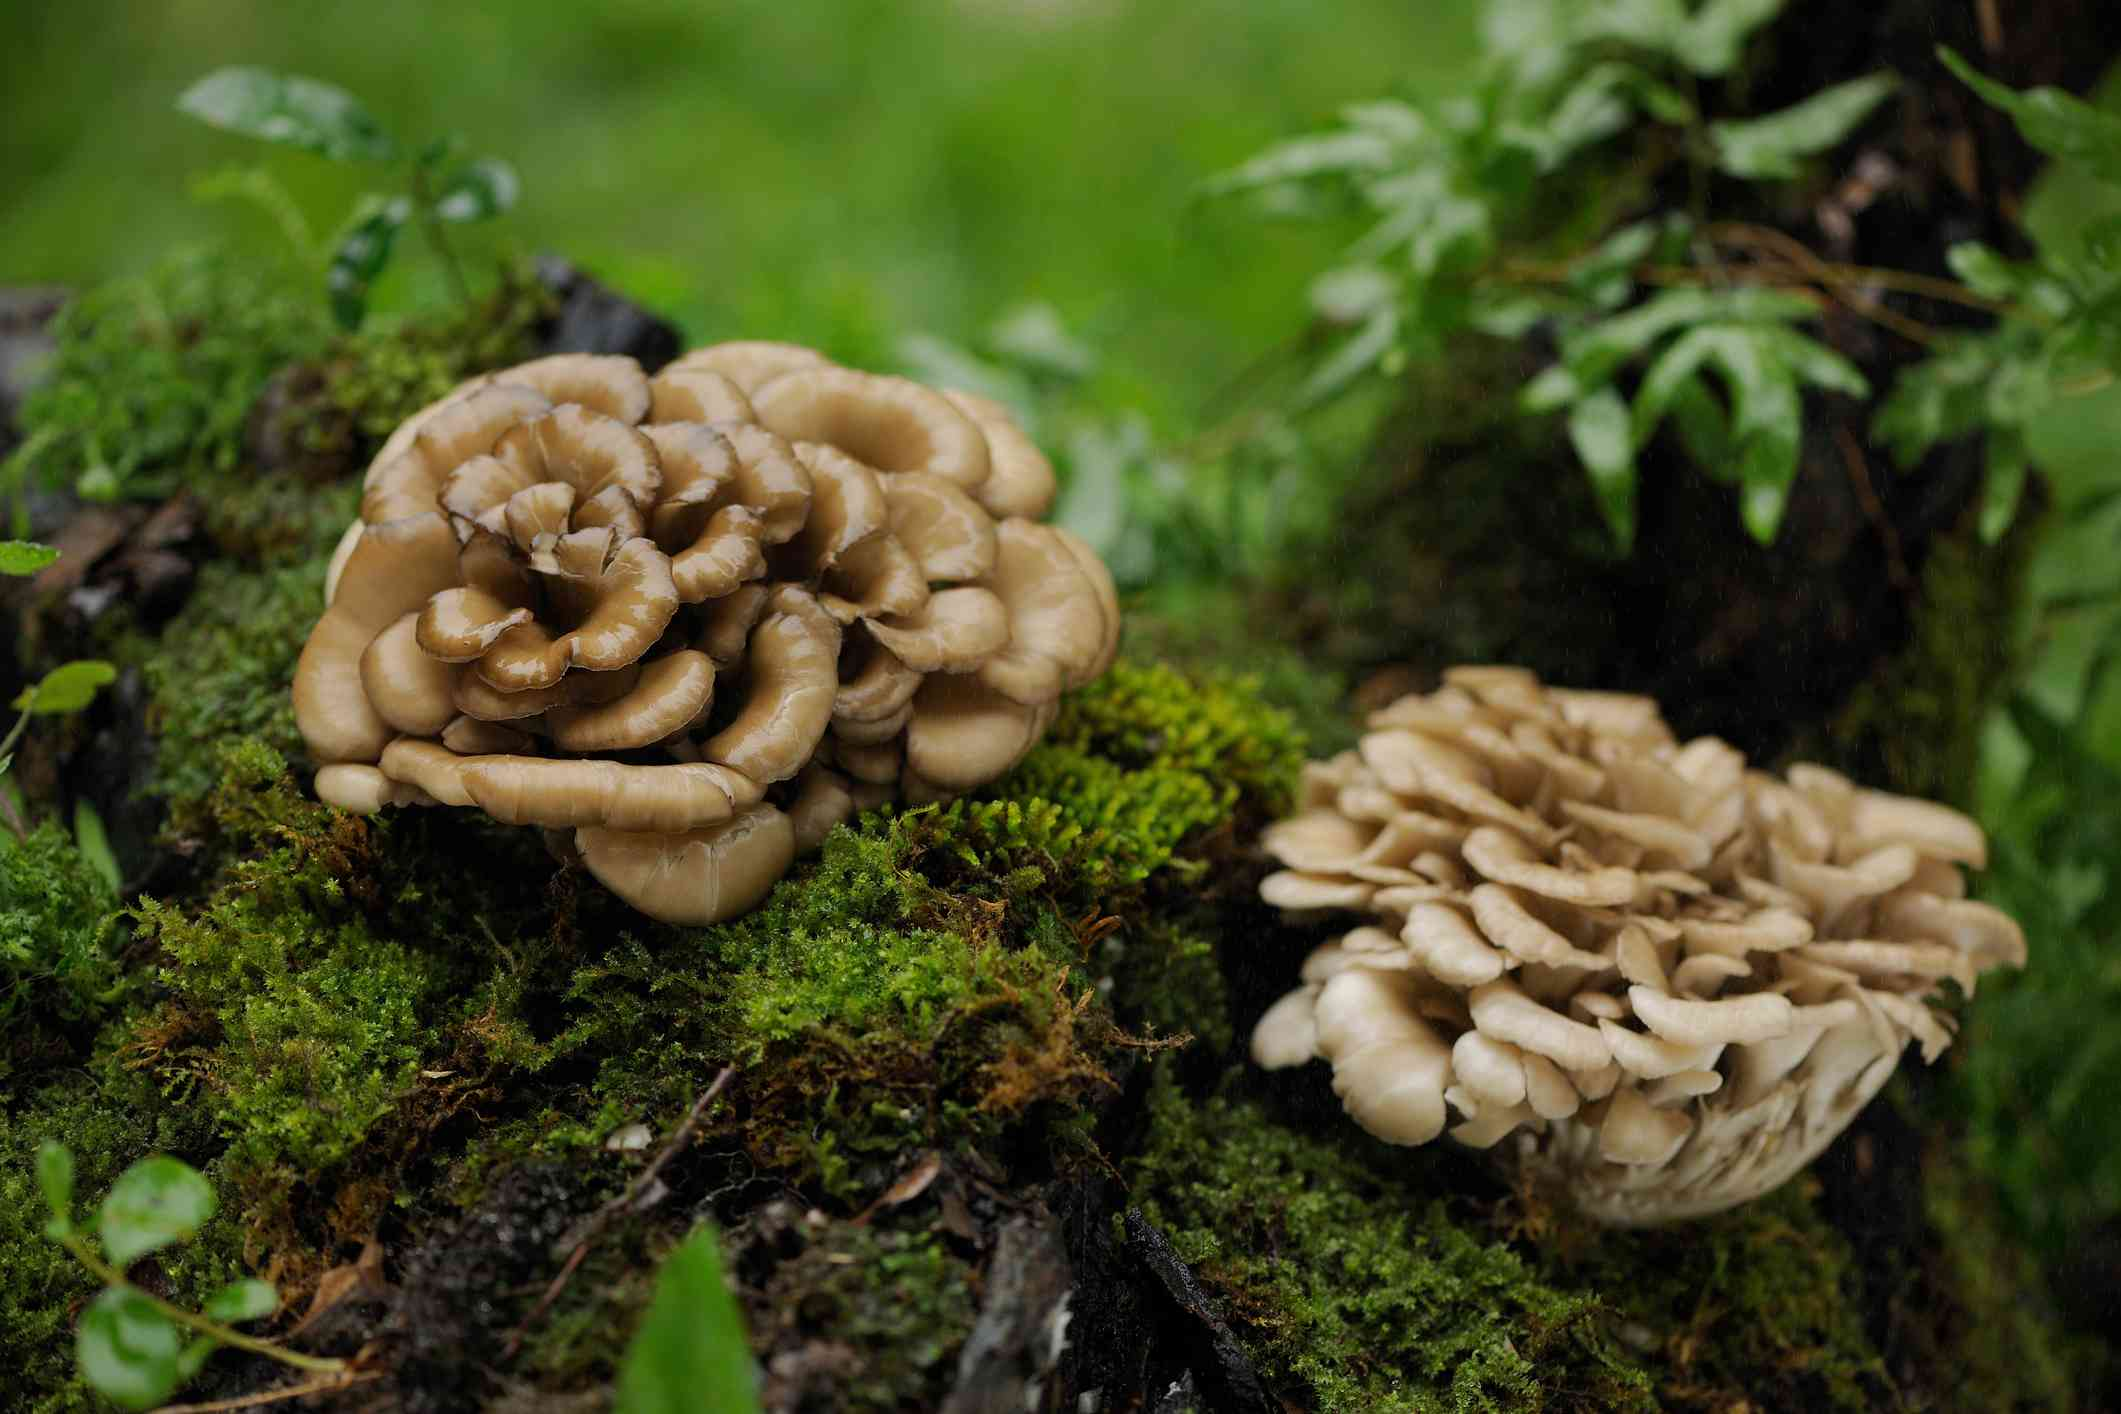 Two maitake mushrooms growing on a mossy log